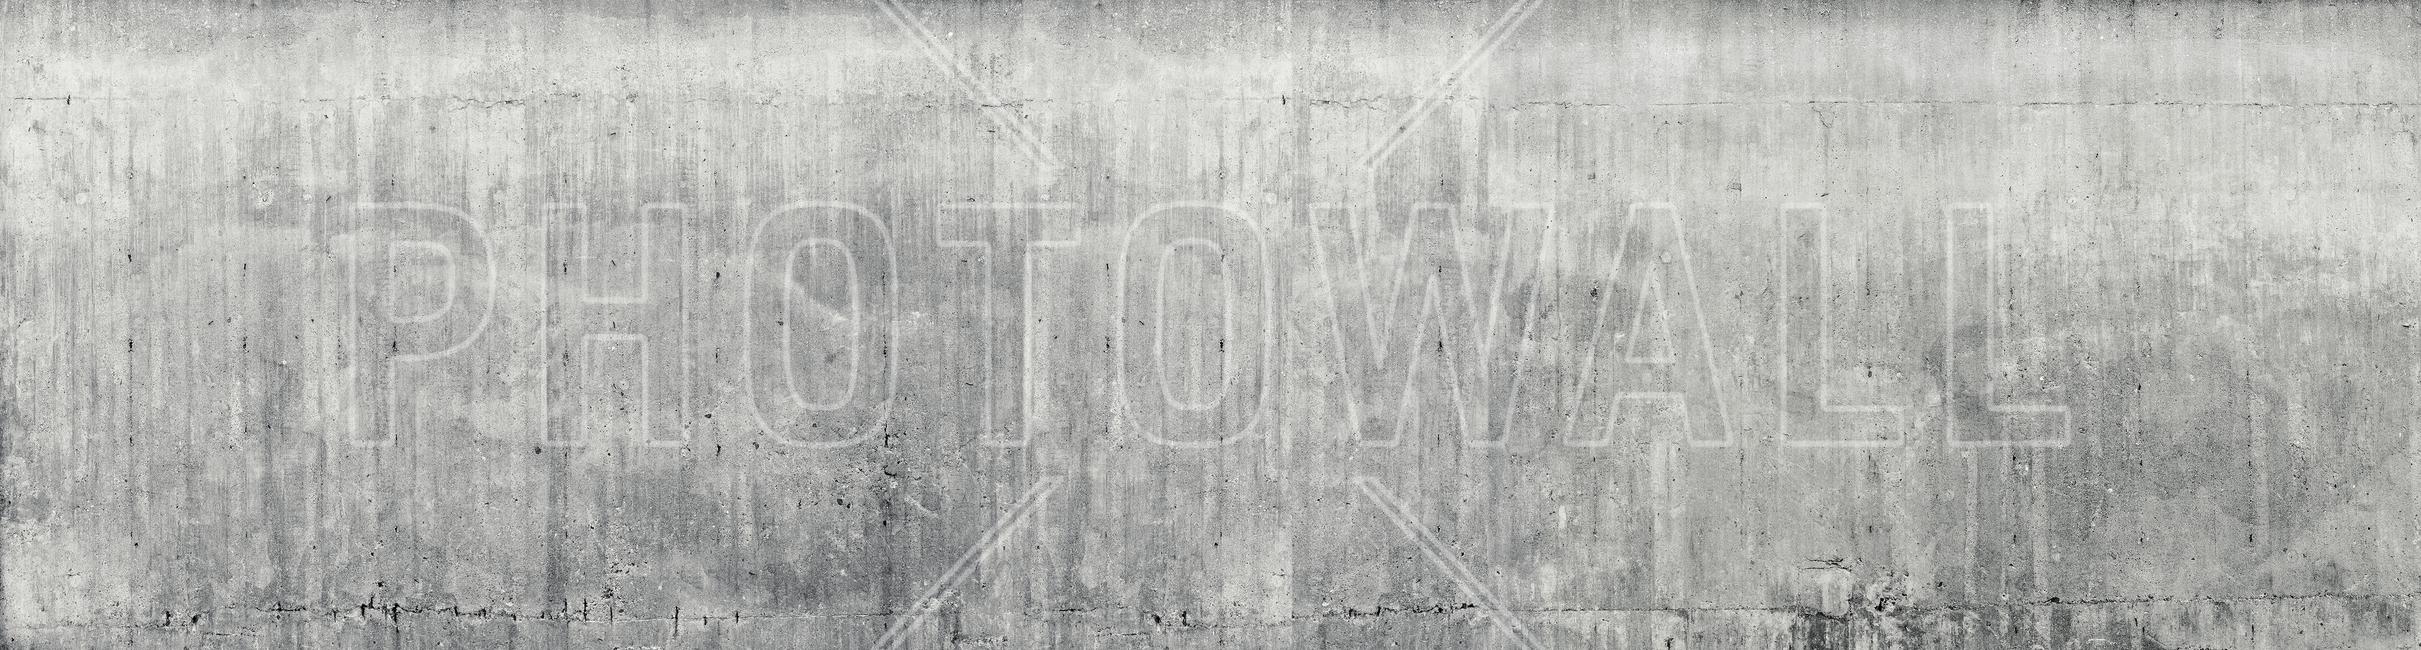 Grunge Concrete Wall Fototapeter & Tapeter 100 x 100 cm